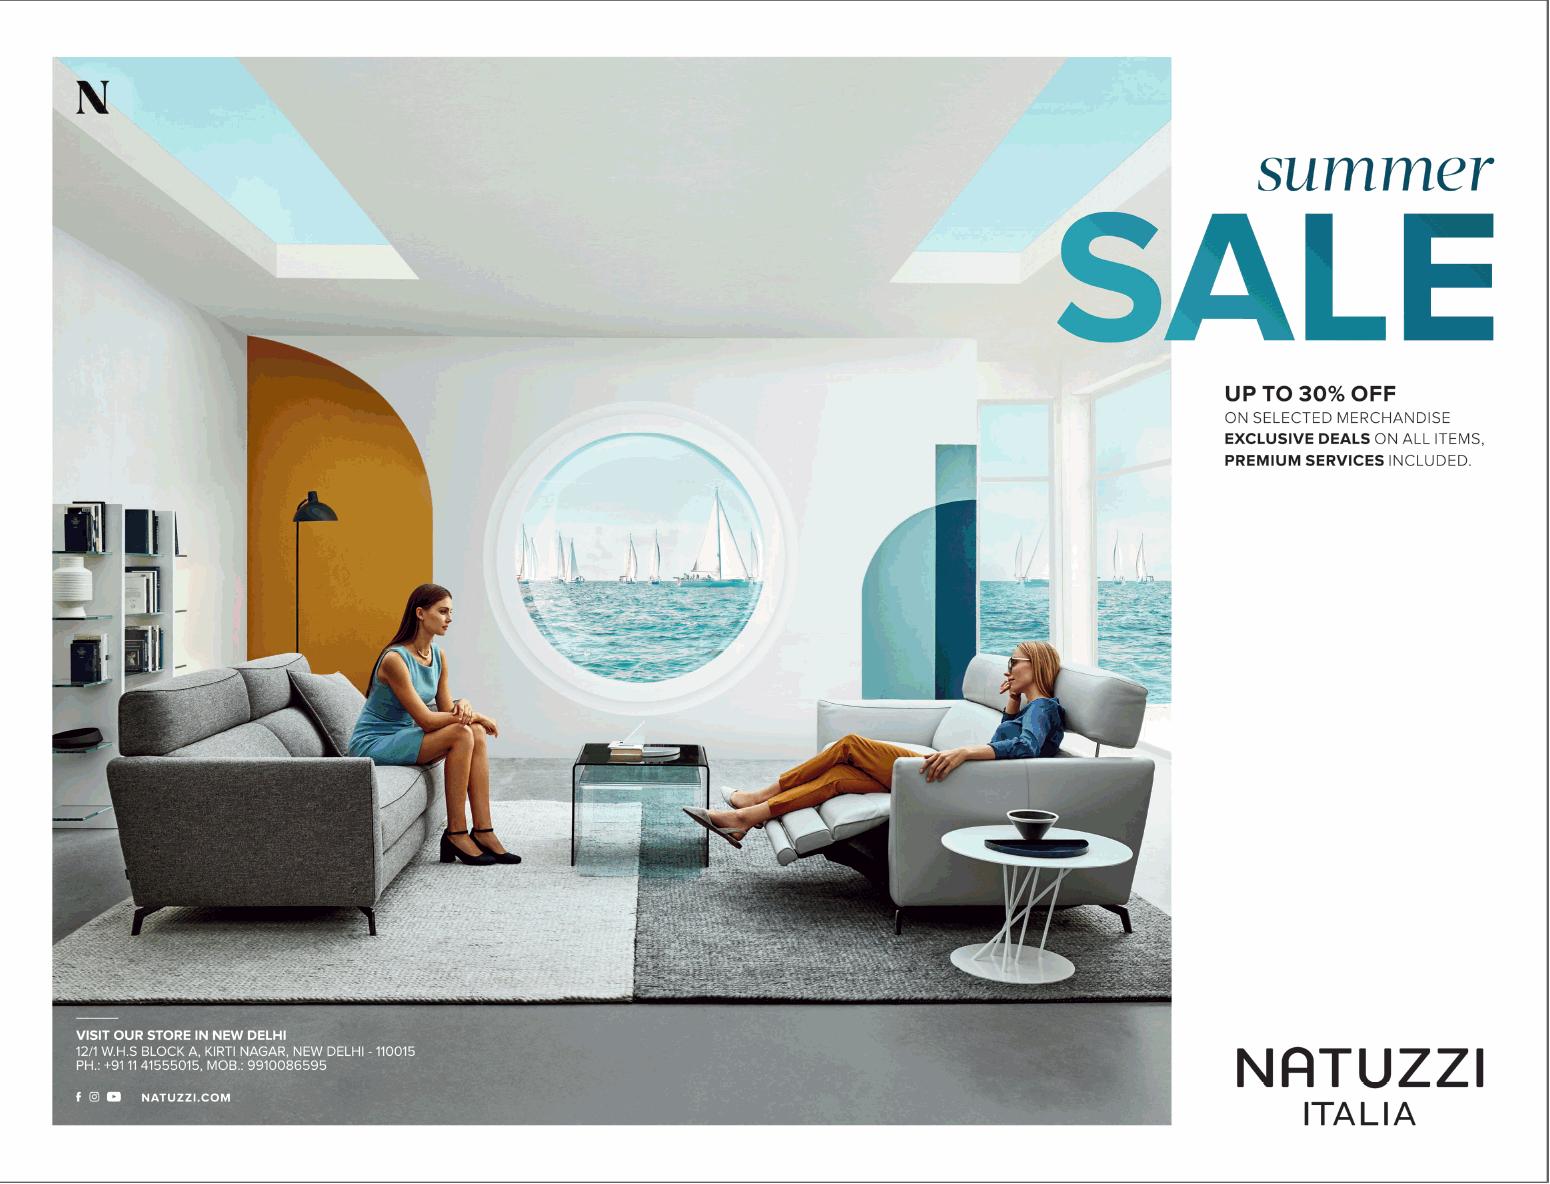 Natuzzi Design Bank.Natuzzi Italia Summer Sale Ad Advert Gallery